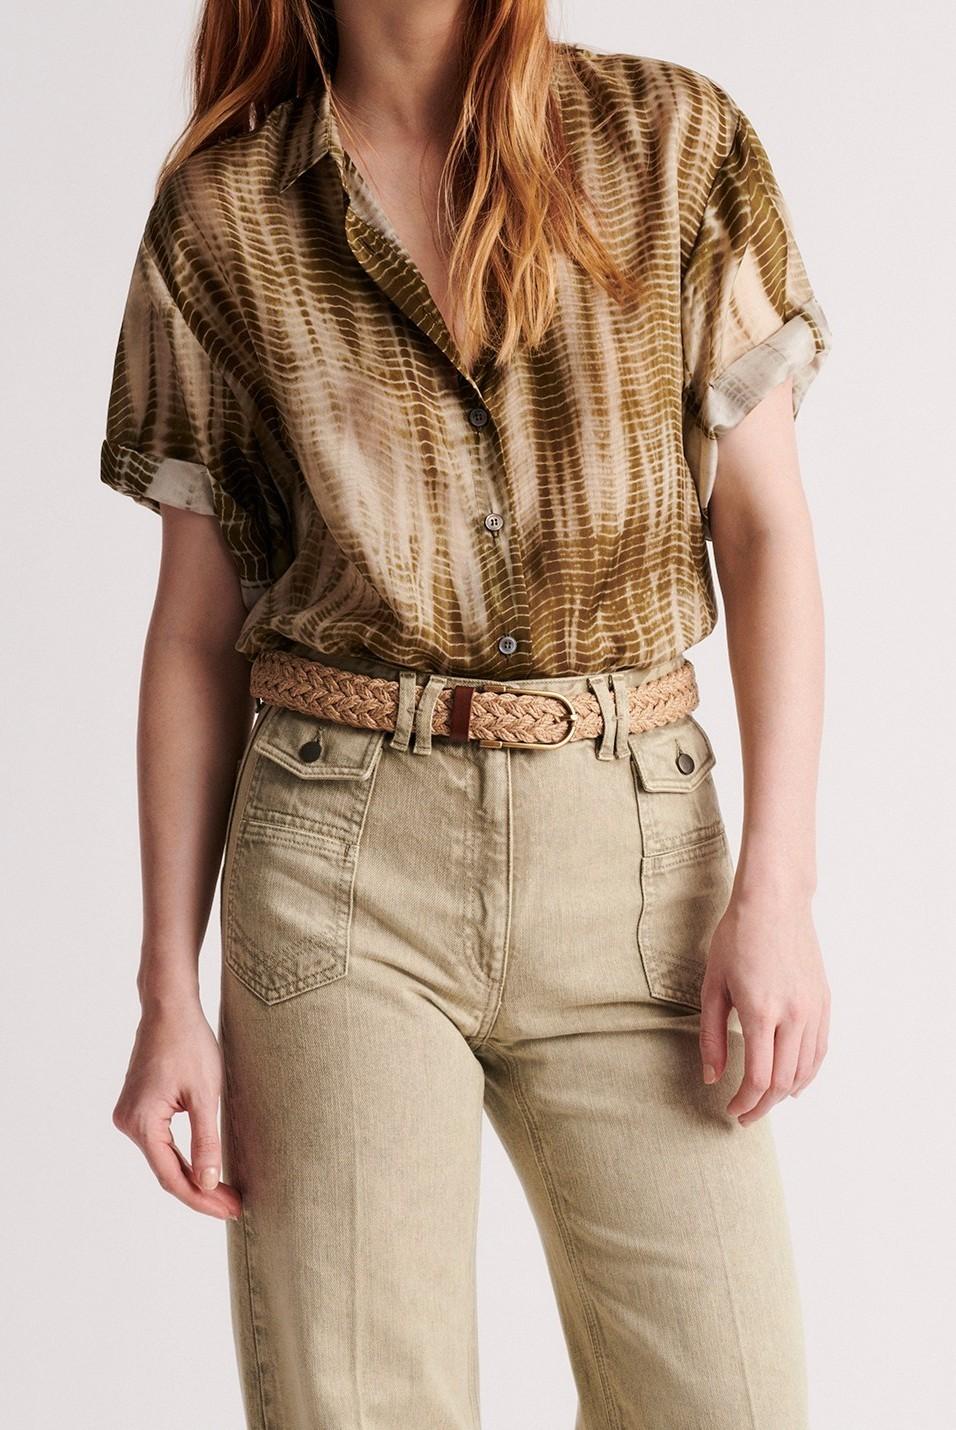 NALINI - шелковая блуза с коротким рукавом и принтом тай-да